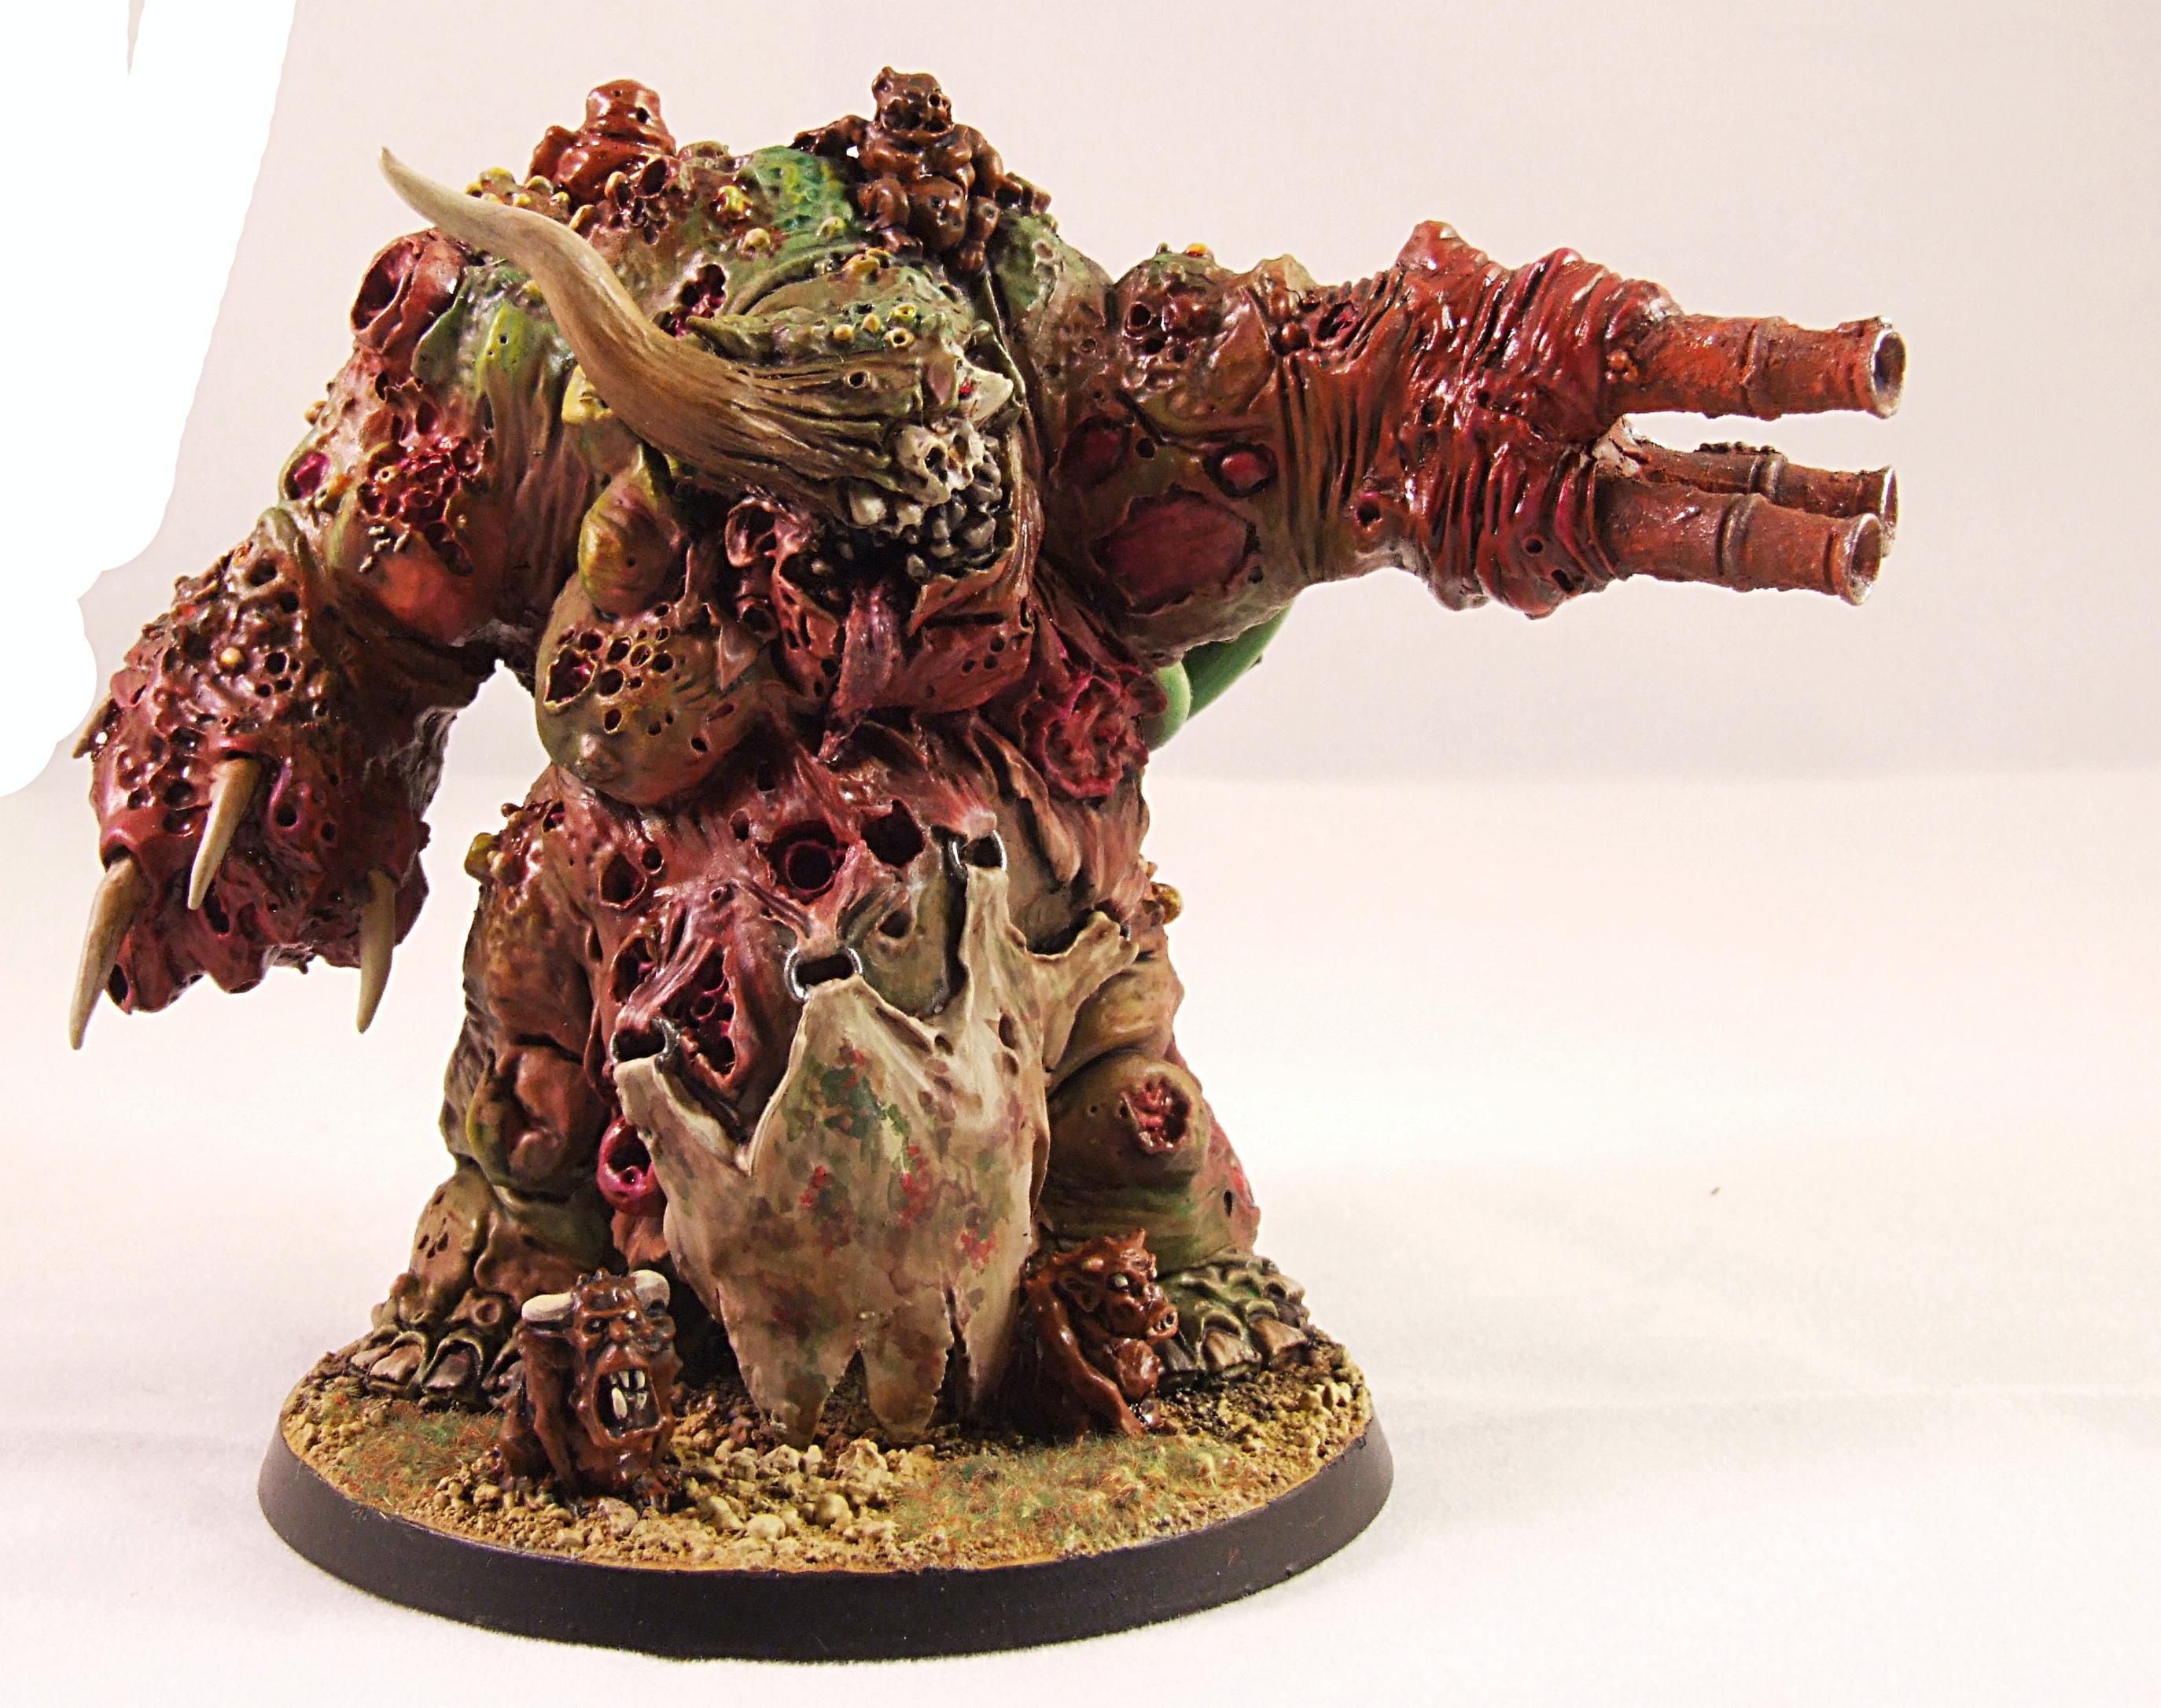 Daemon Prince, Daemons, Forge World, Mamon, Nurgle, Warhammer 40,000